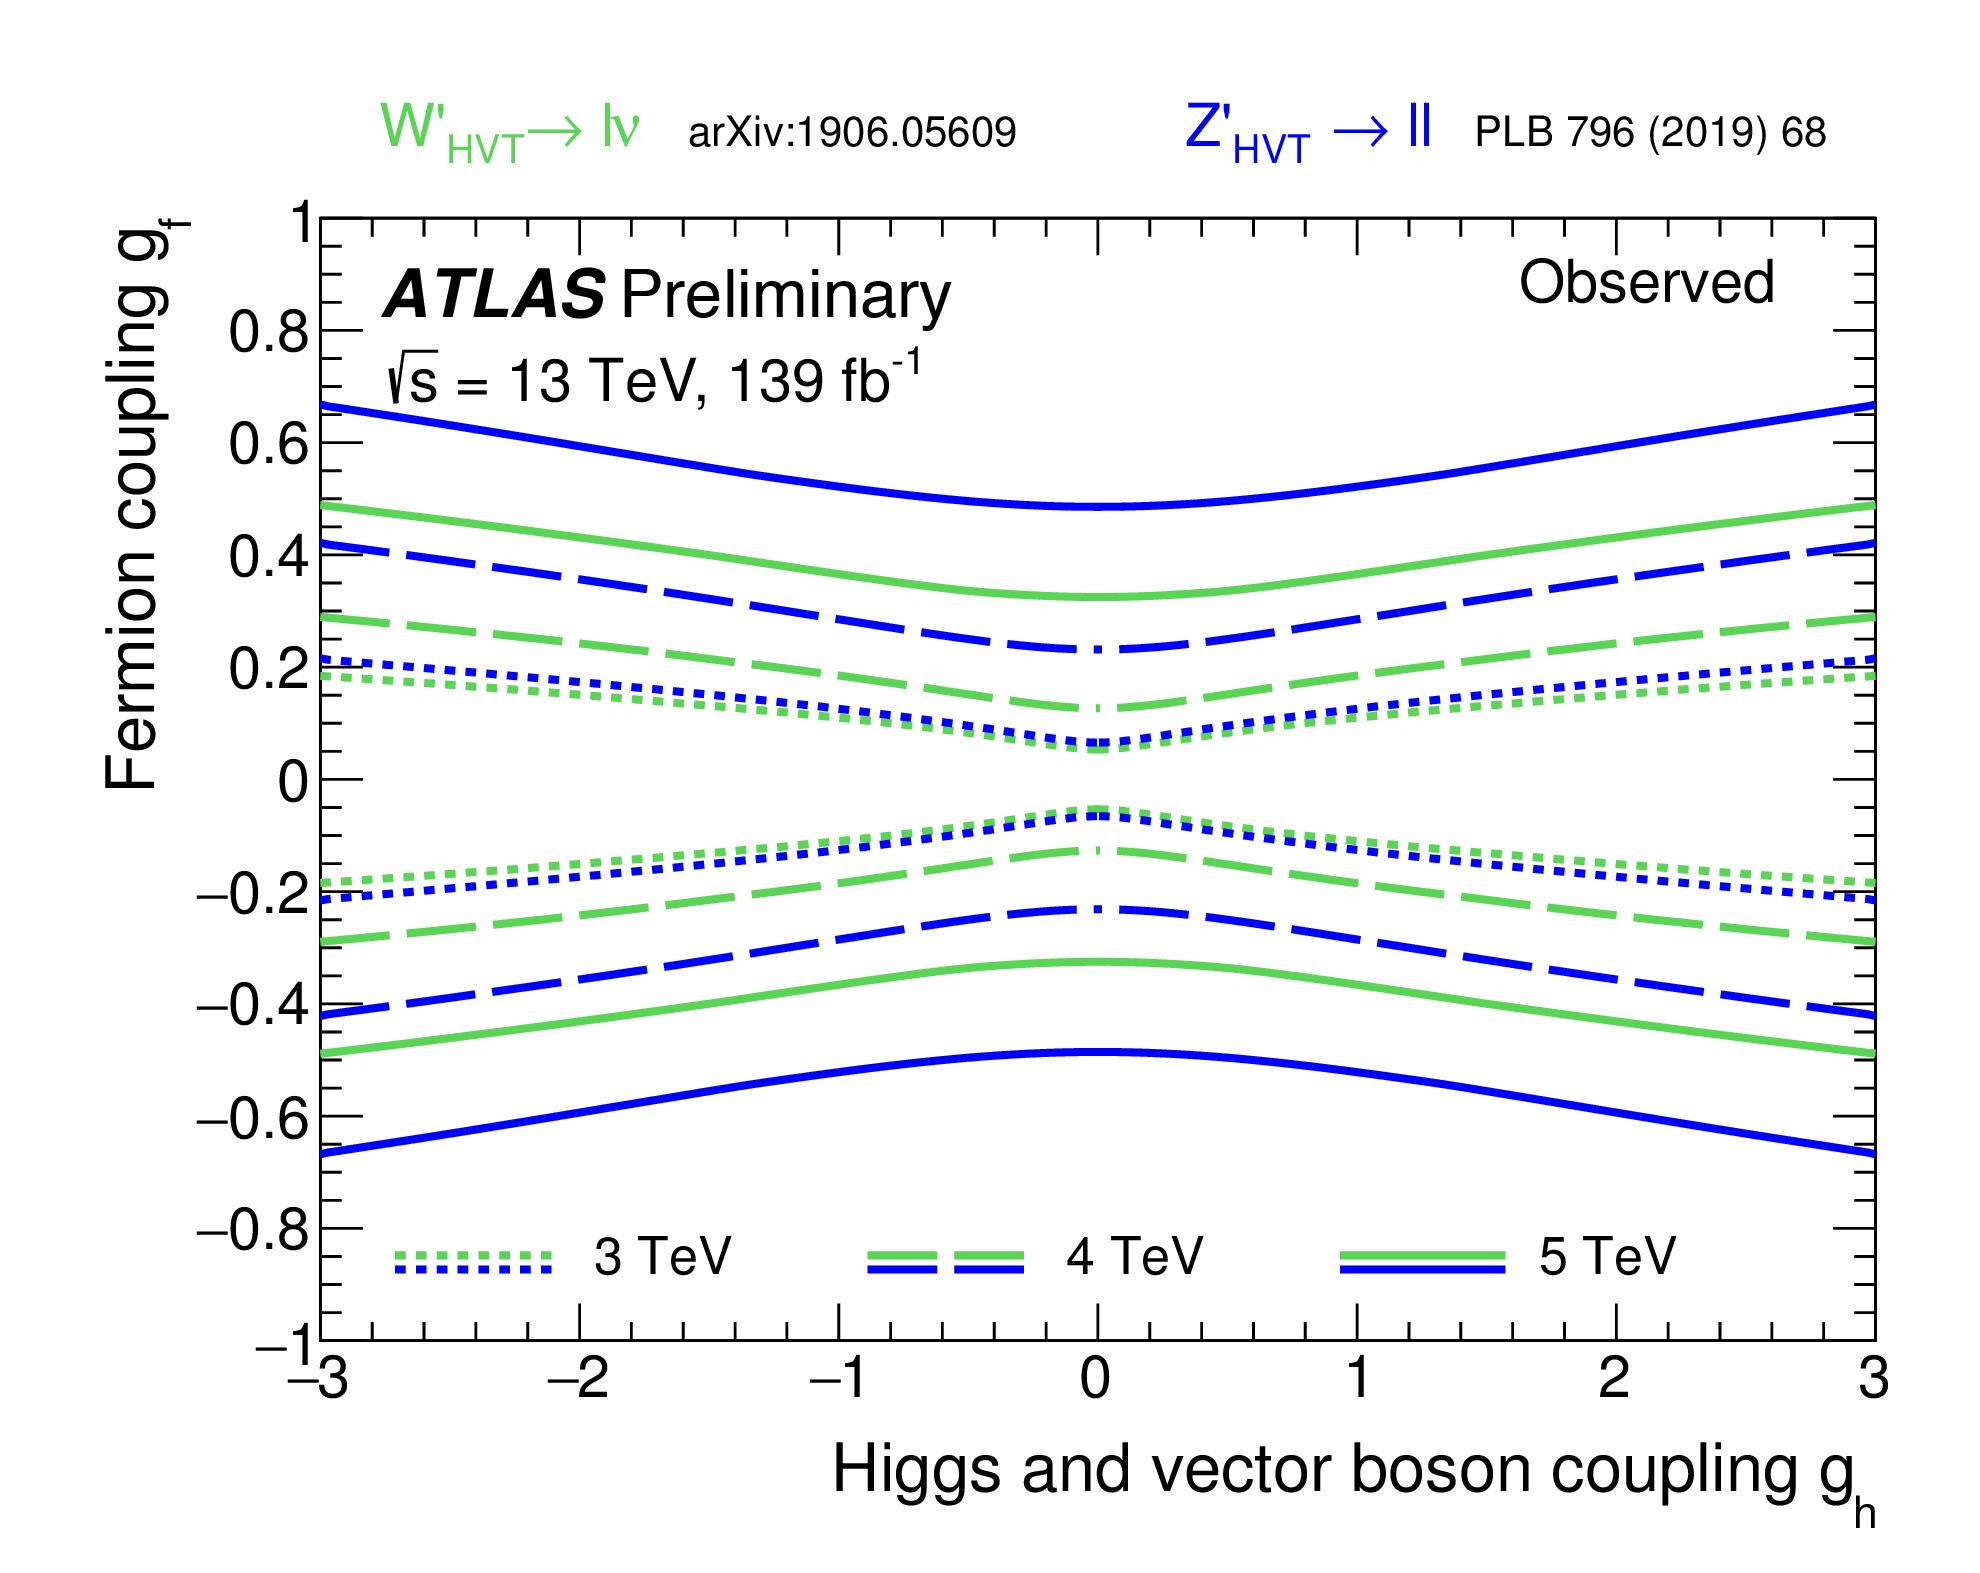 https://atlas.web.cern.ch/Atlas/GROUPS/PHYSICS/CombinedSummaryPlots/EXOTICS/ATLAS_HVT_Lepton_Summary_gf_gh_obs/ATLAS_HVT_Lepton_Summary_gf_gh_obs.png